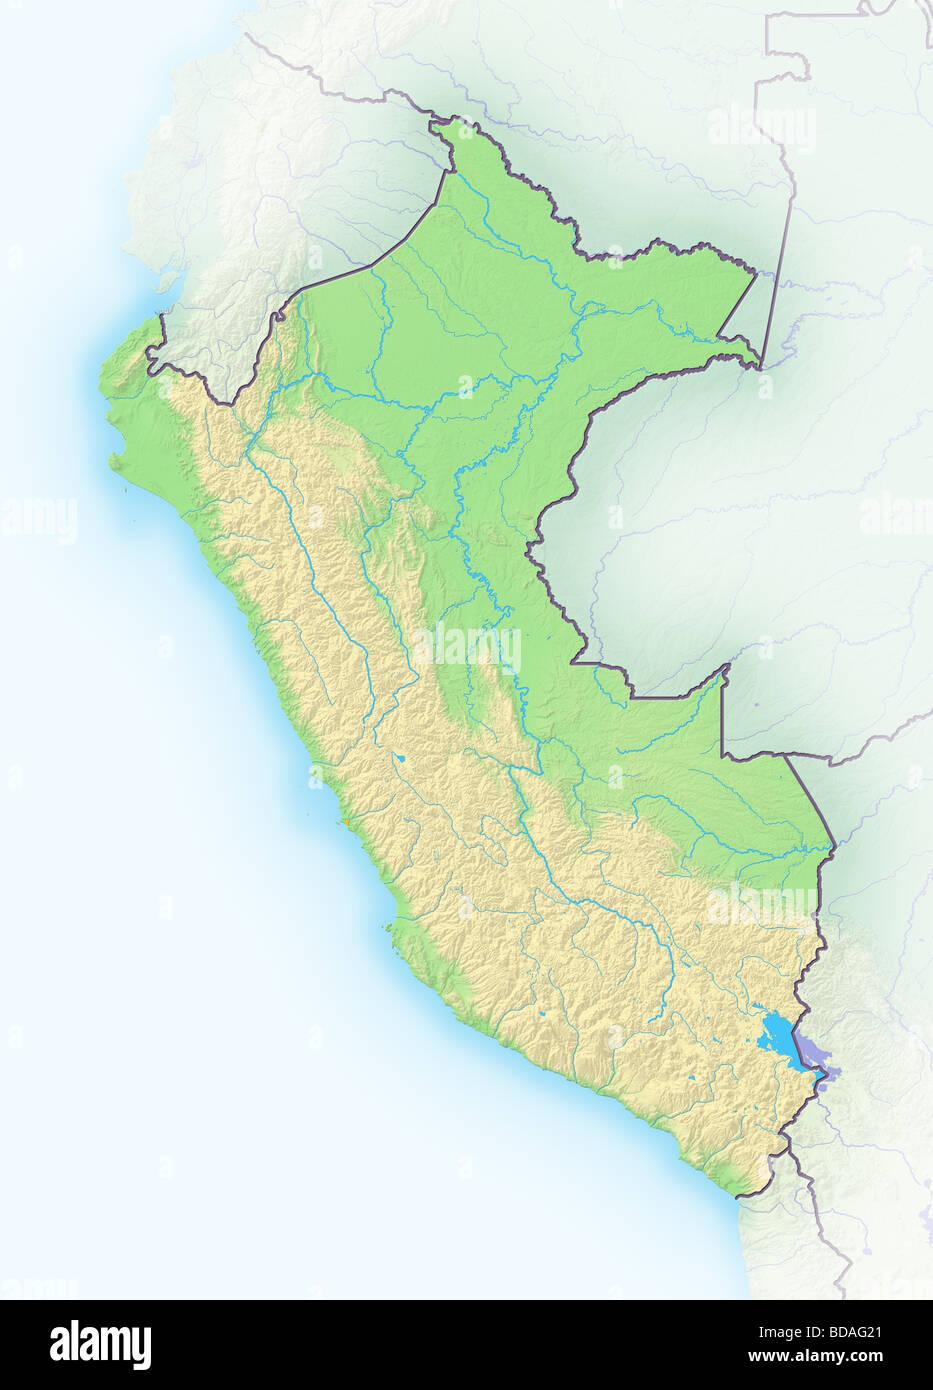 Peru Map Stockfotos & Peru Map Bilder - Alamy